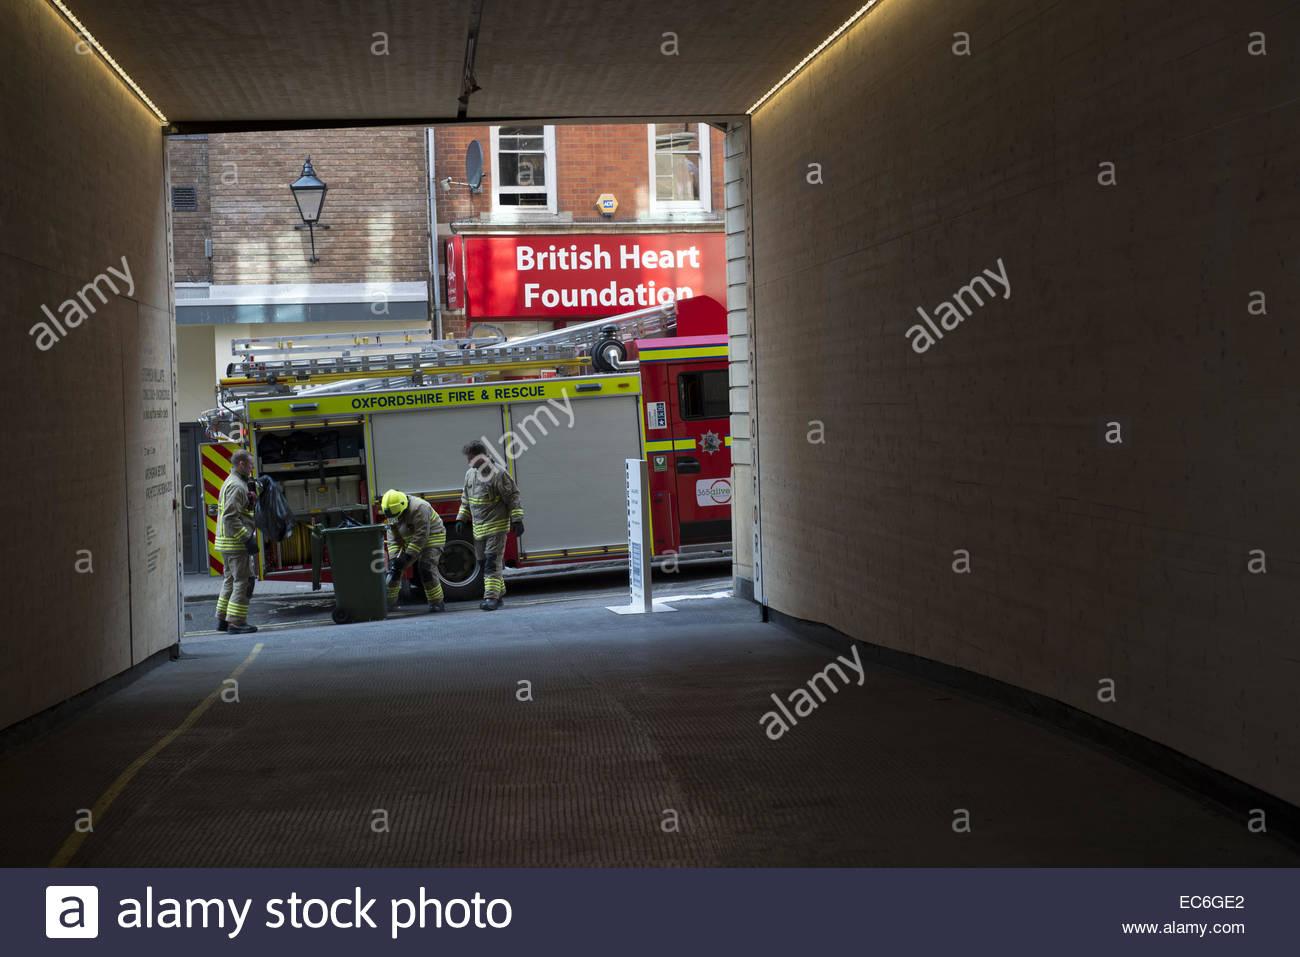 Firebrigade in Oxford - Stock Image